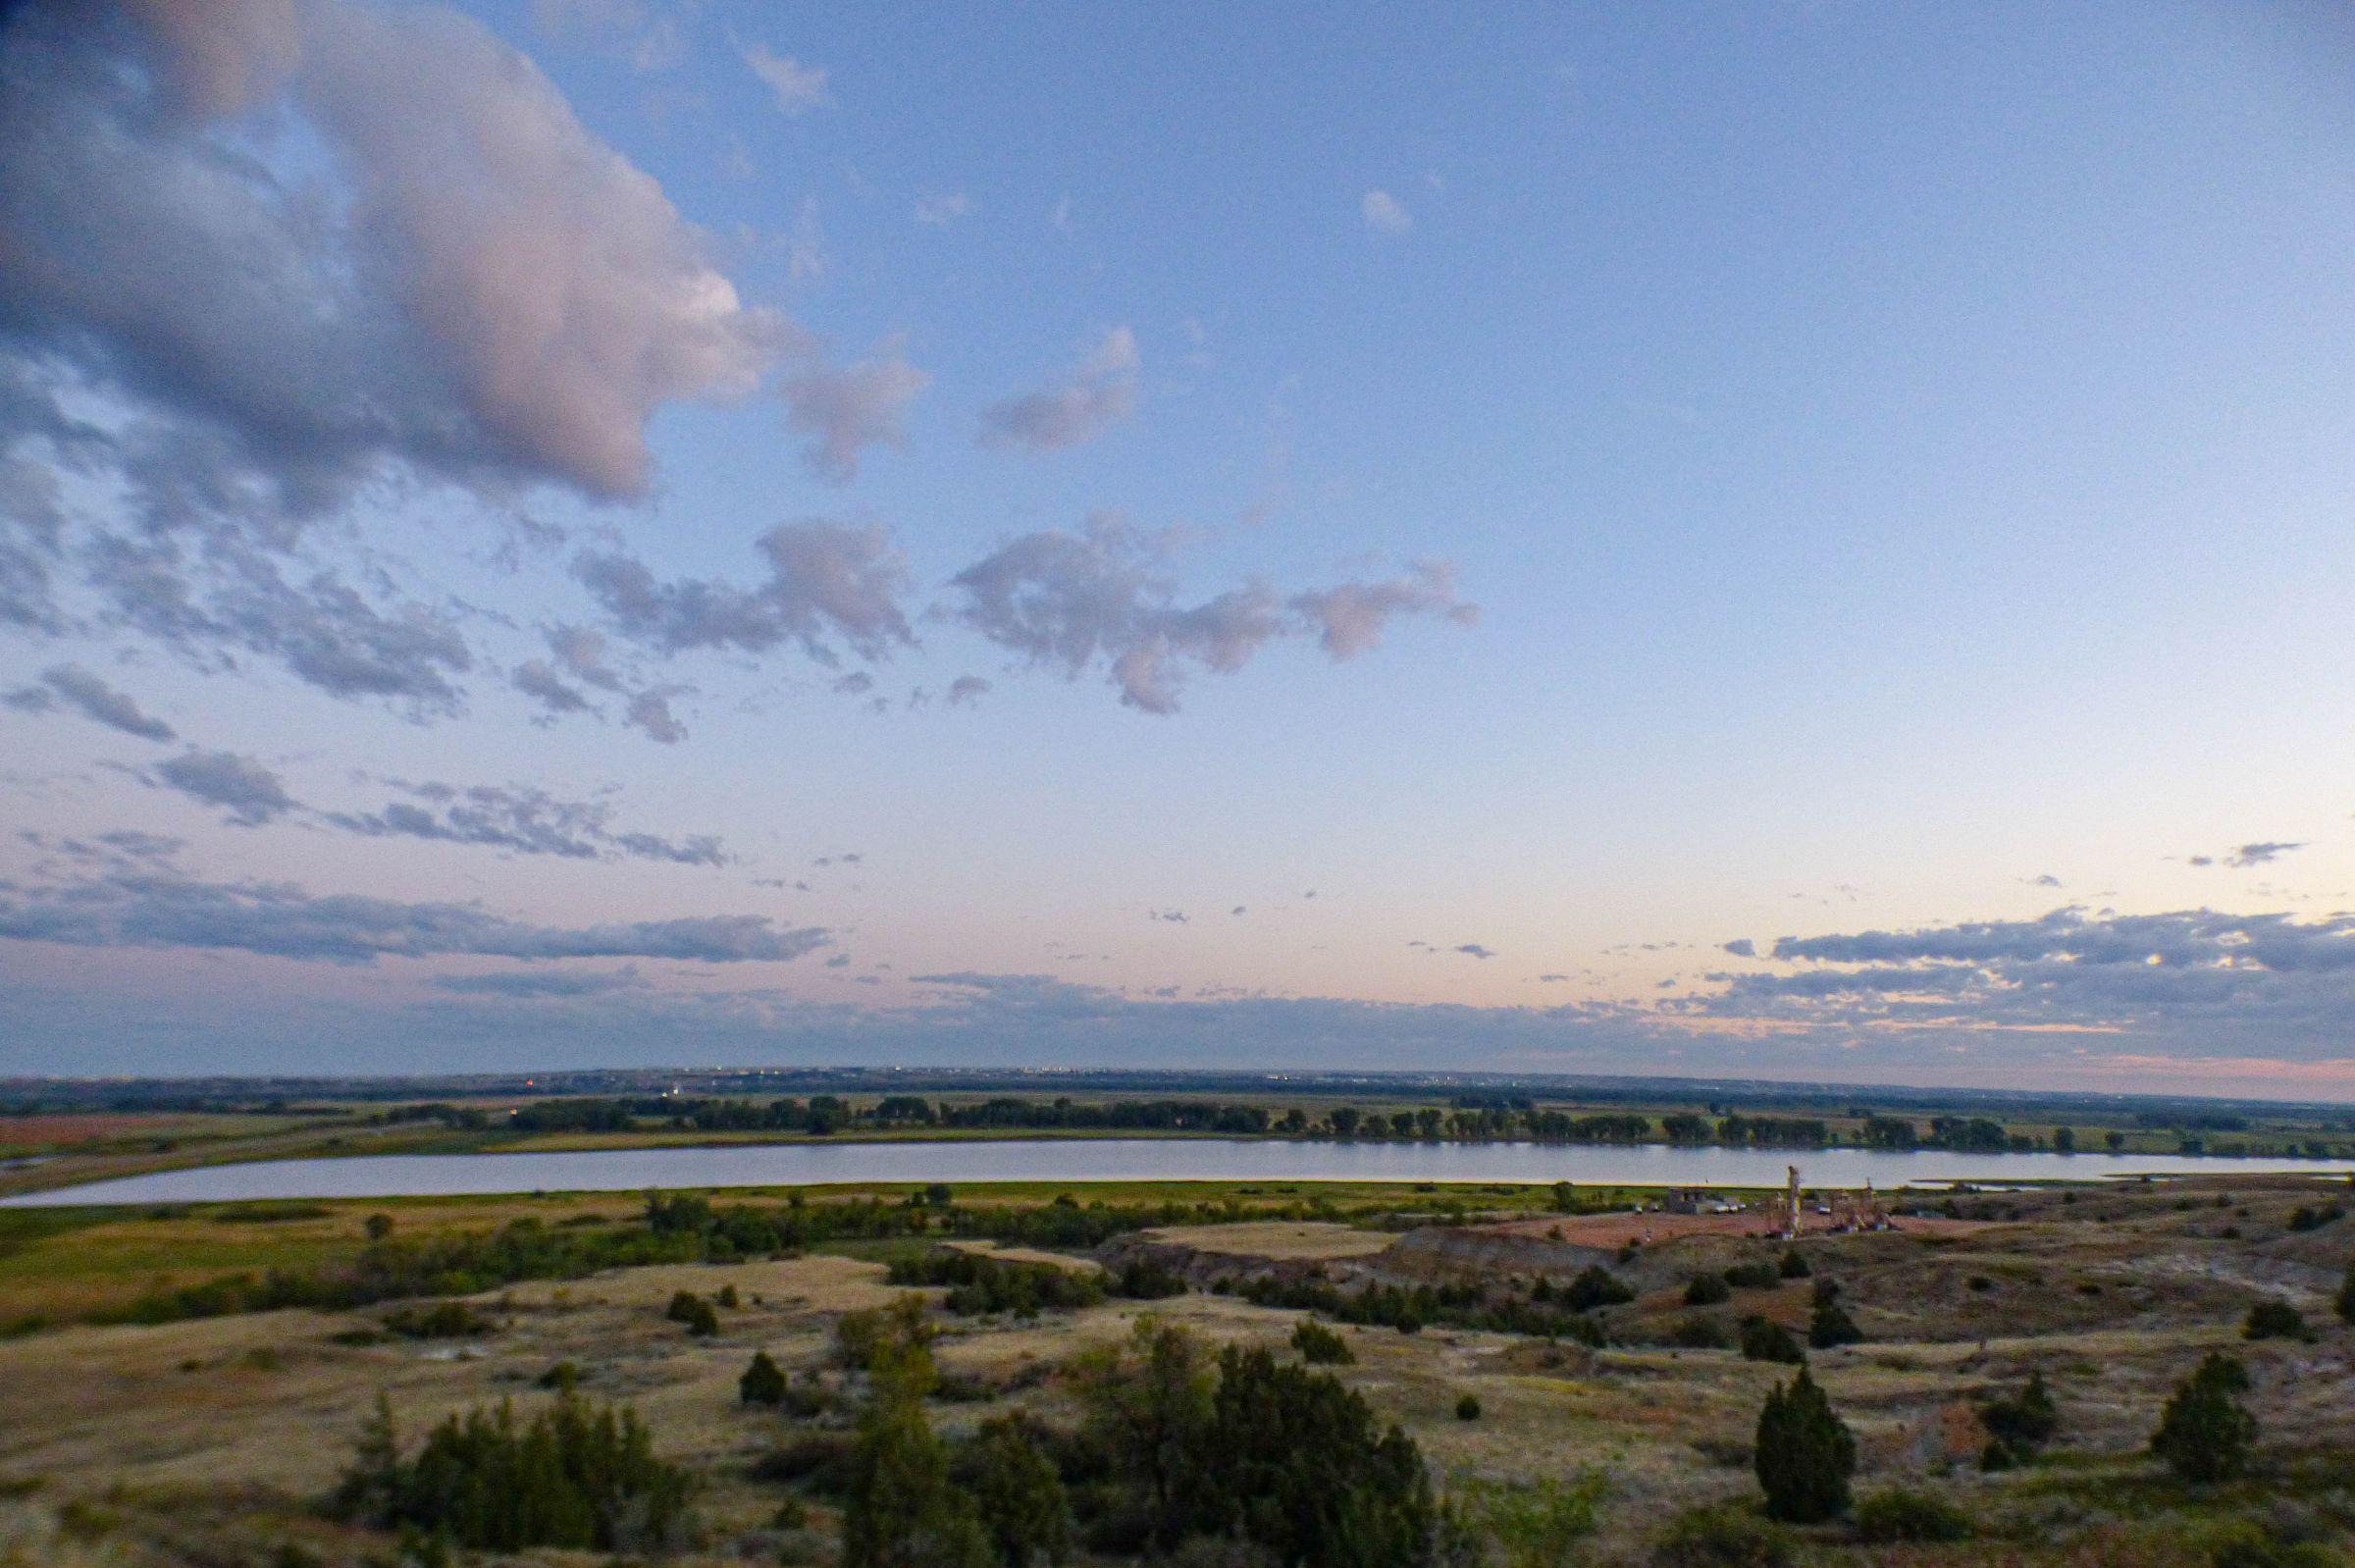 auctions-land-mckenzie-county-north-dakota-270-acres-listing-number-15735-6-2021-09-10-011326.jpg